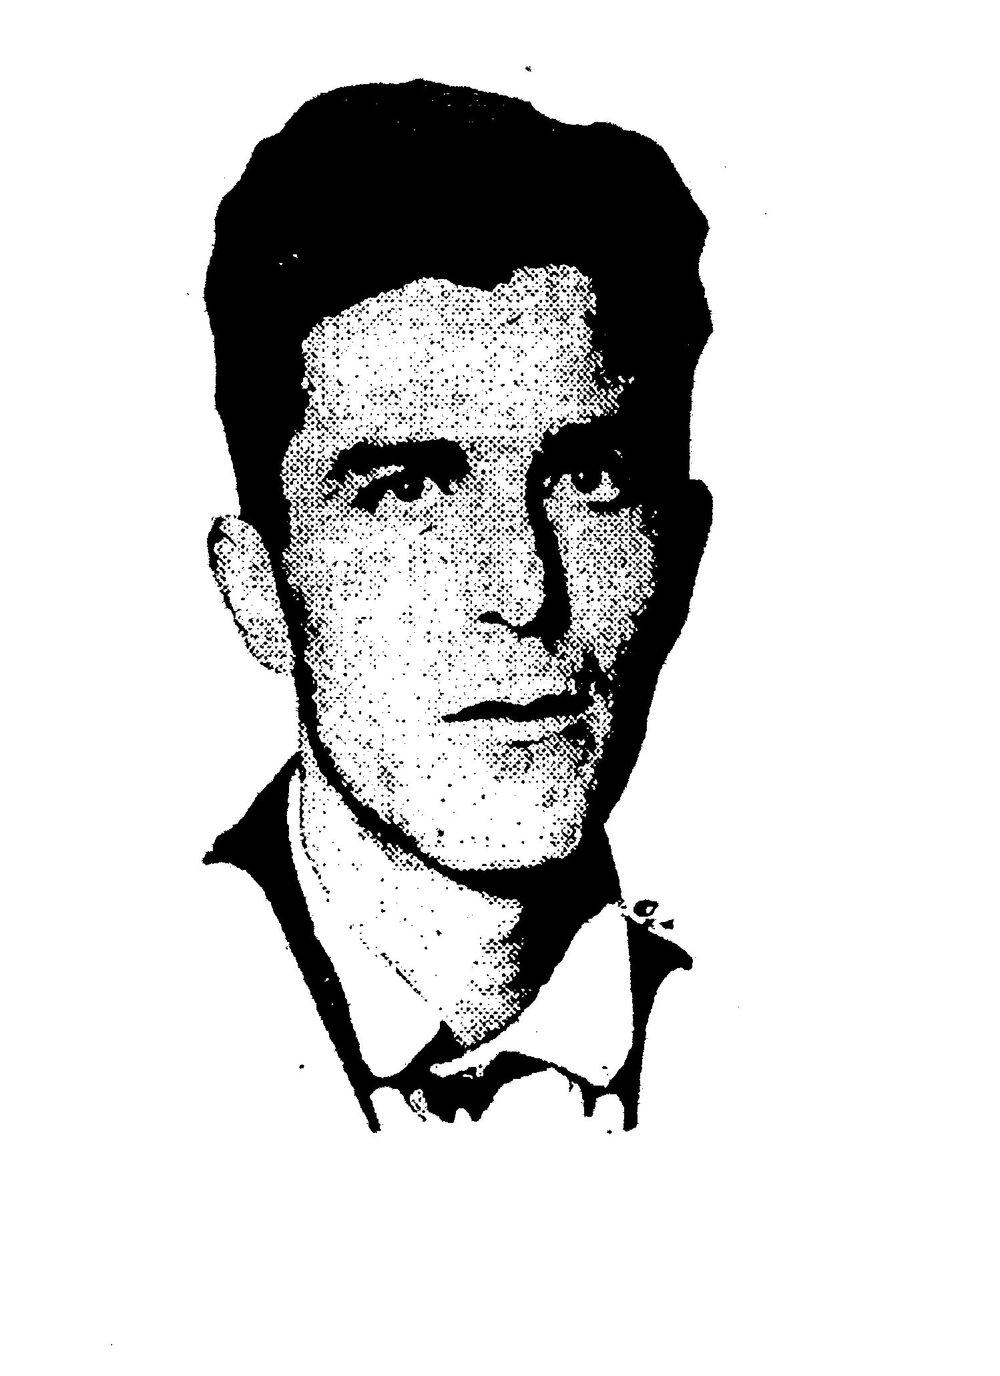 Pietro Crudele